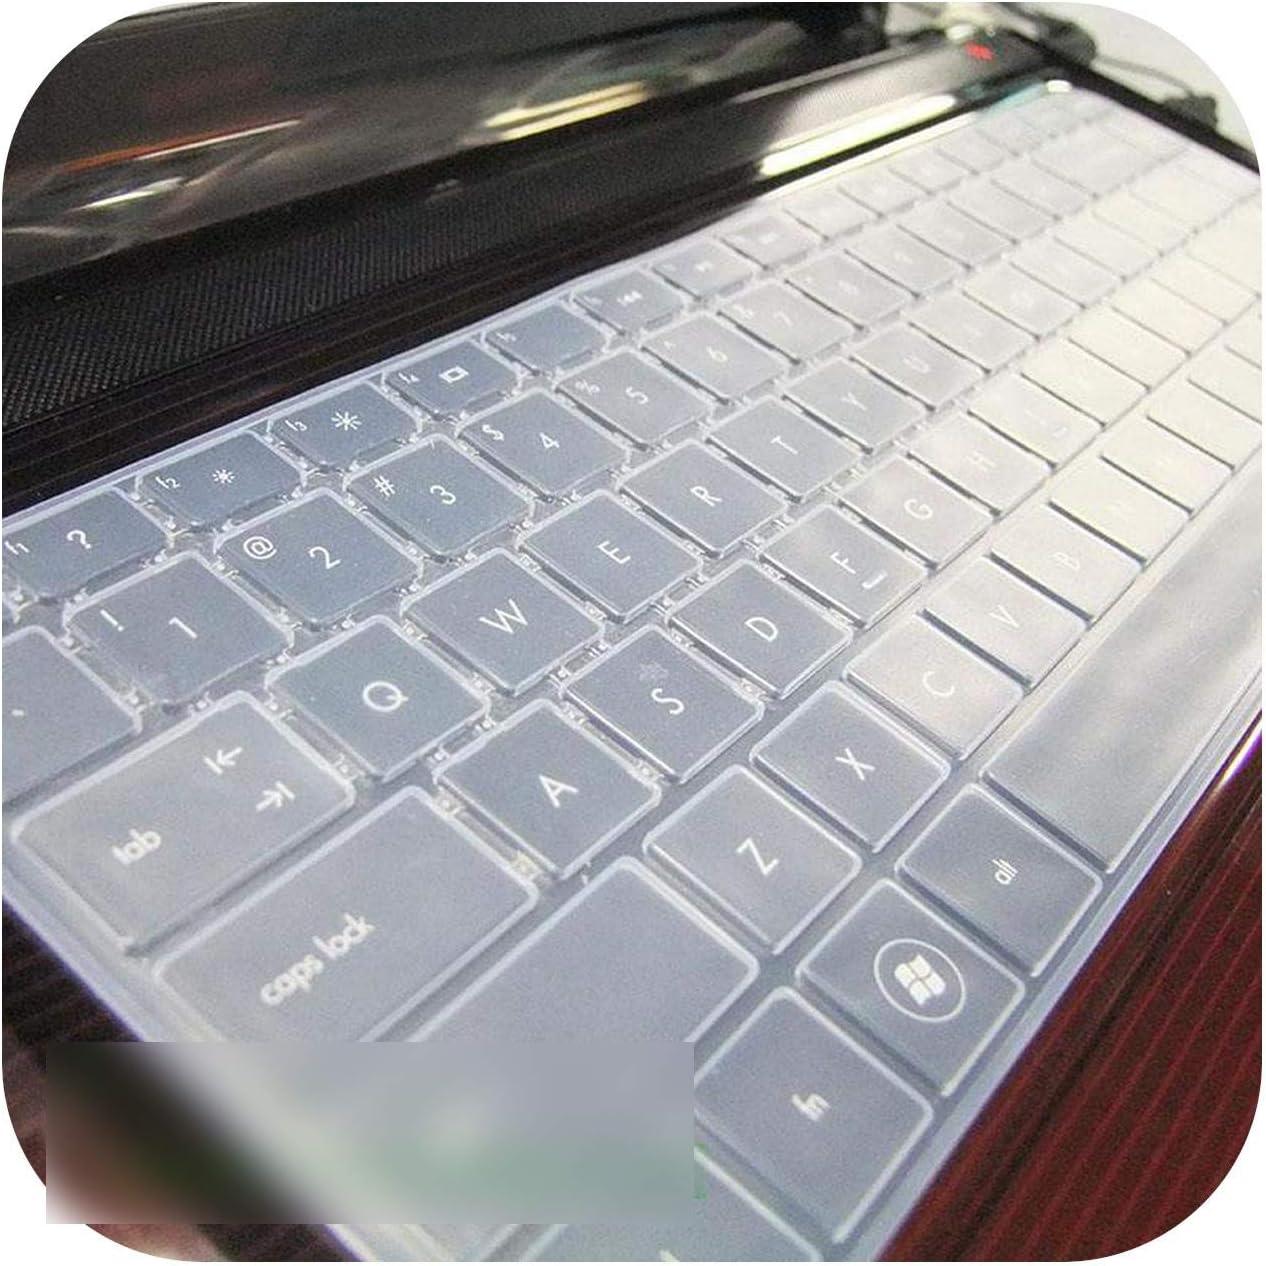 New Silicone Keyboard Cover for Hp Pavilion G4 Envy 4 6 Hp1000 Dv4 Cq45 Cq43 Hp450 1000 2000 431 Cq43-Transparent